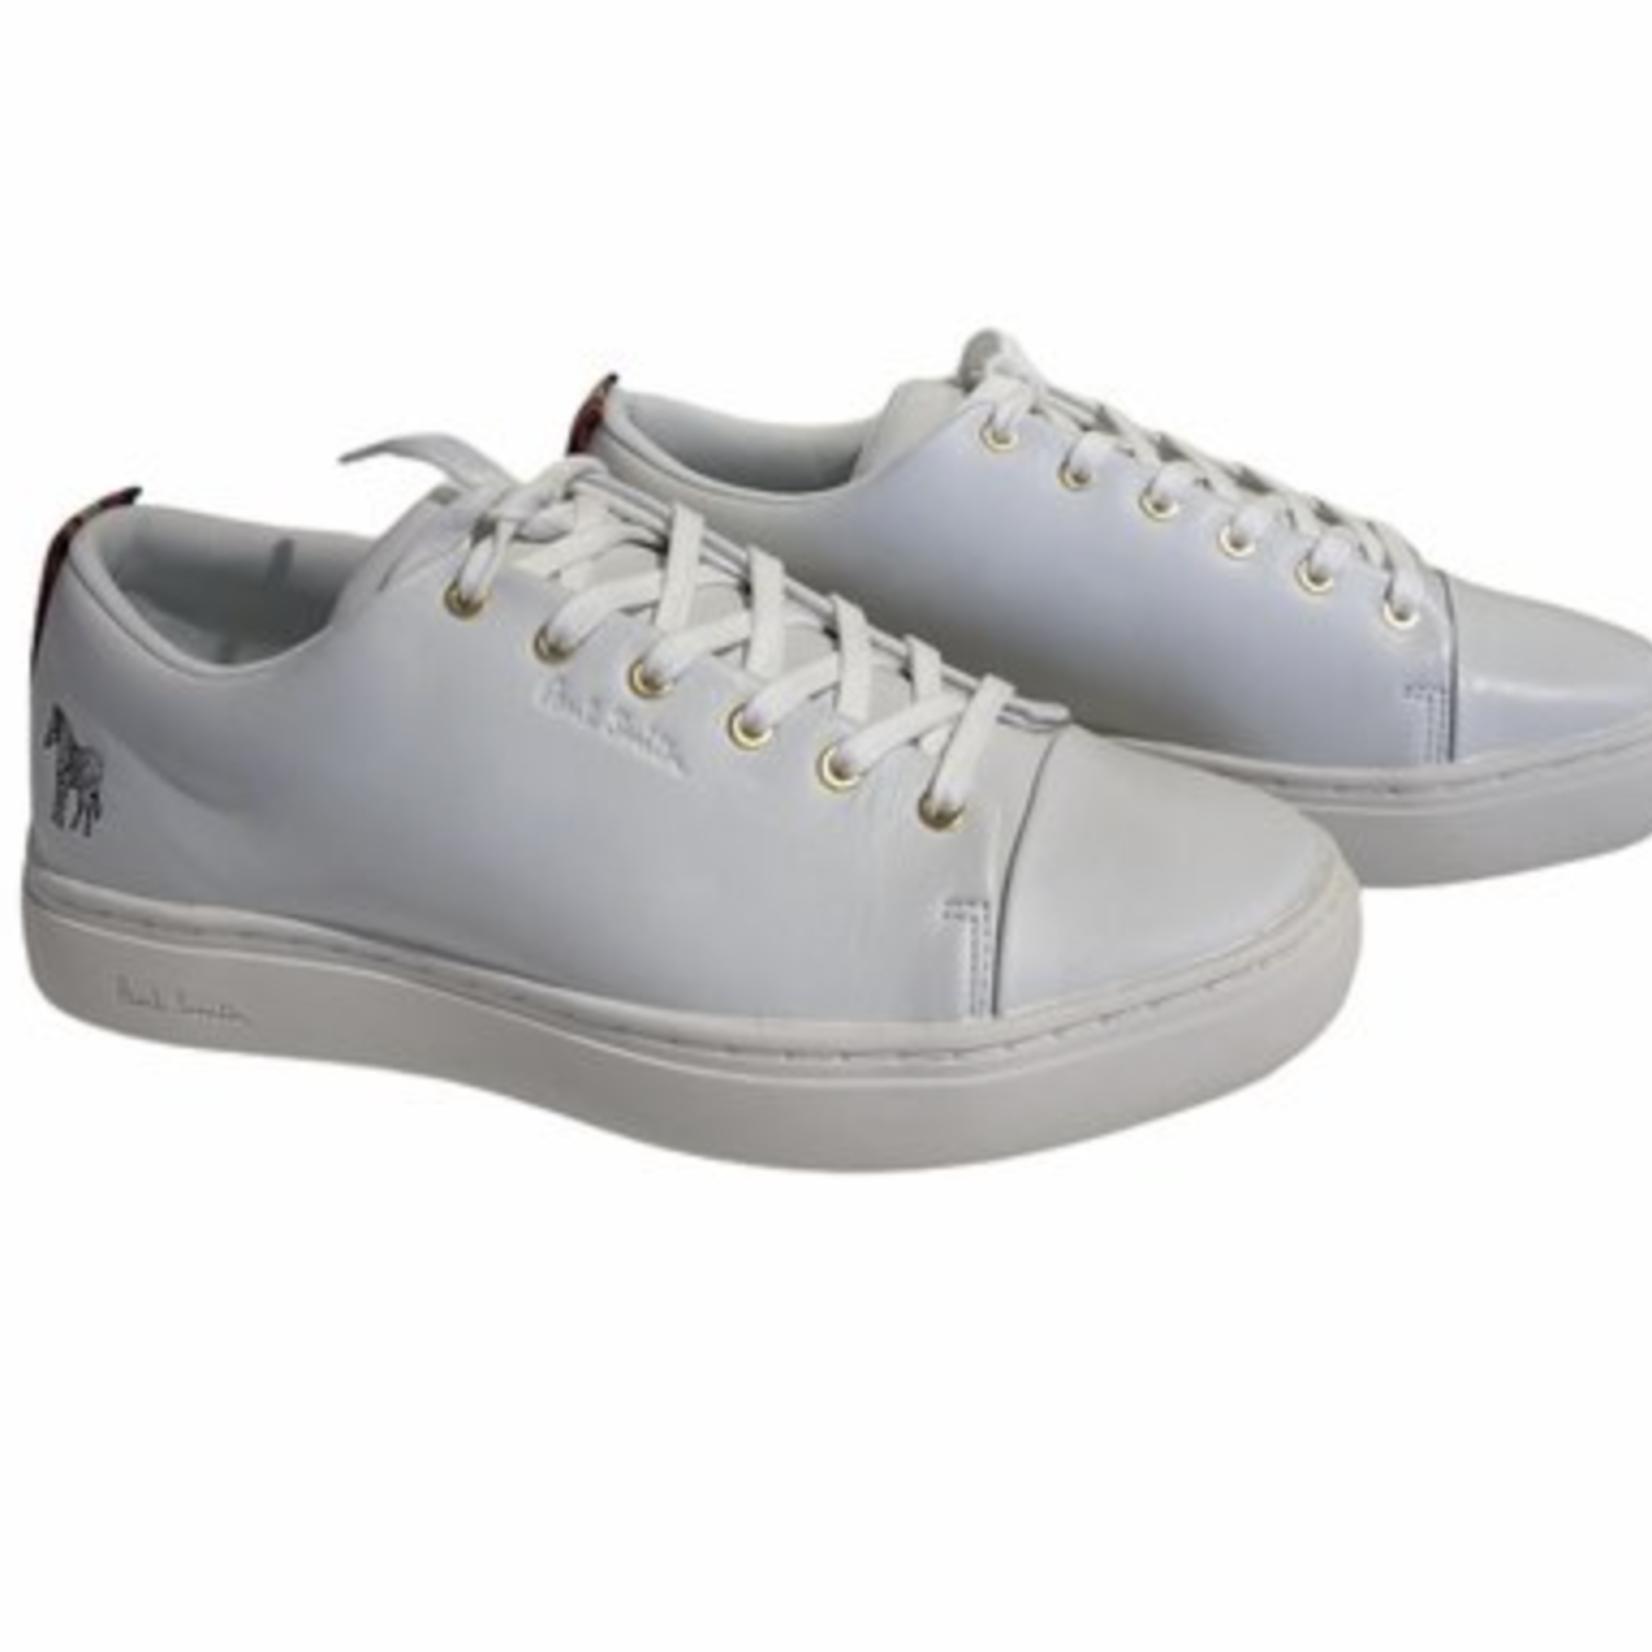 Paul Smith  Lee sneakers